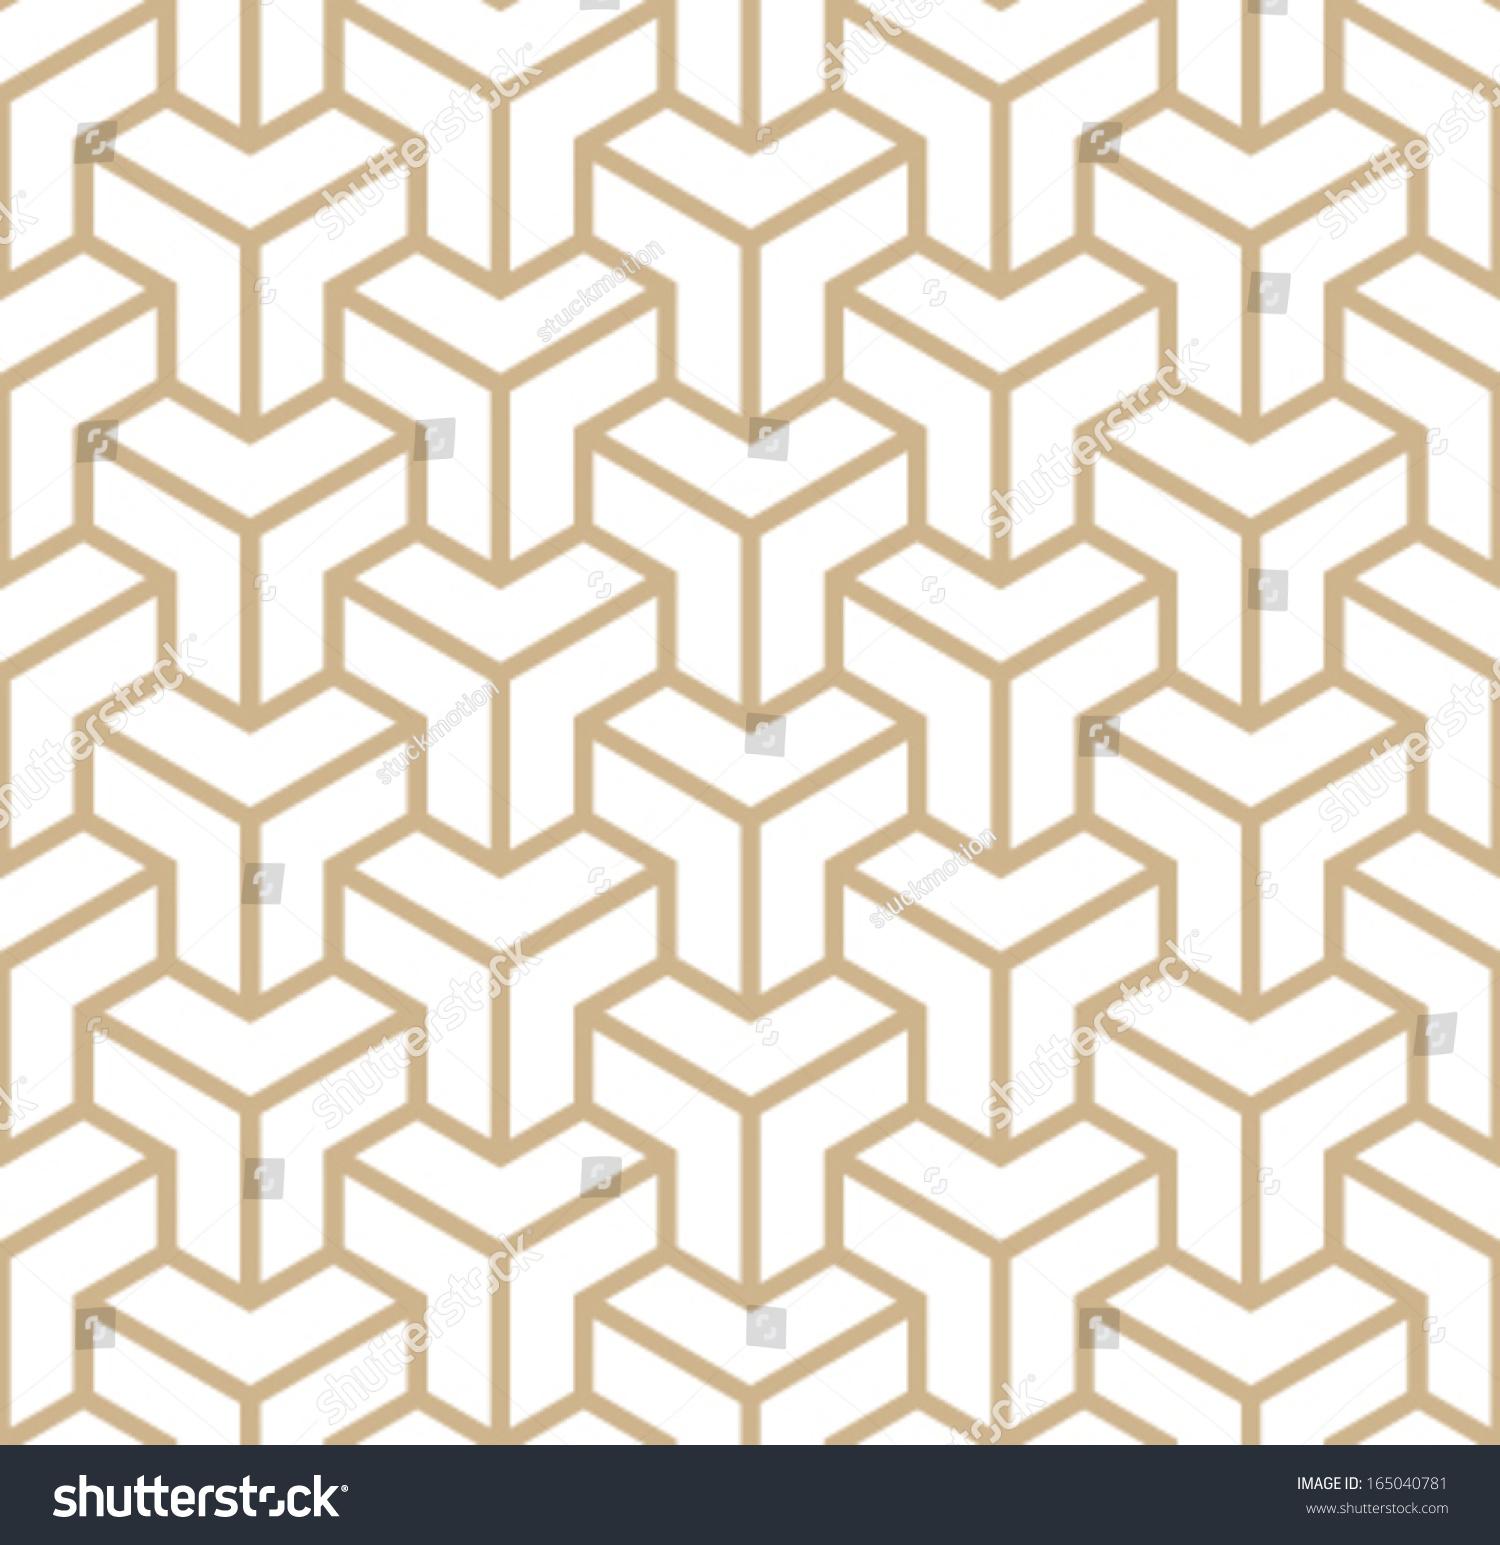 geometric patterns wallpaper black and white